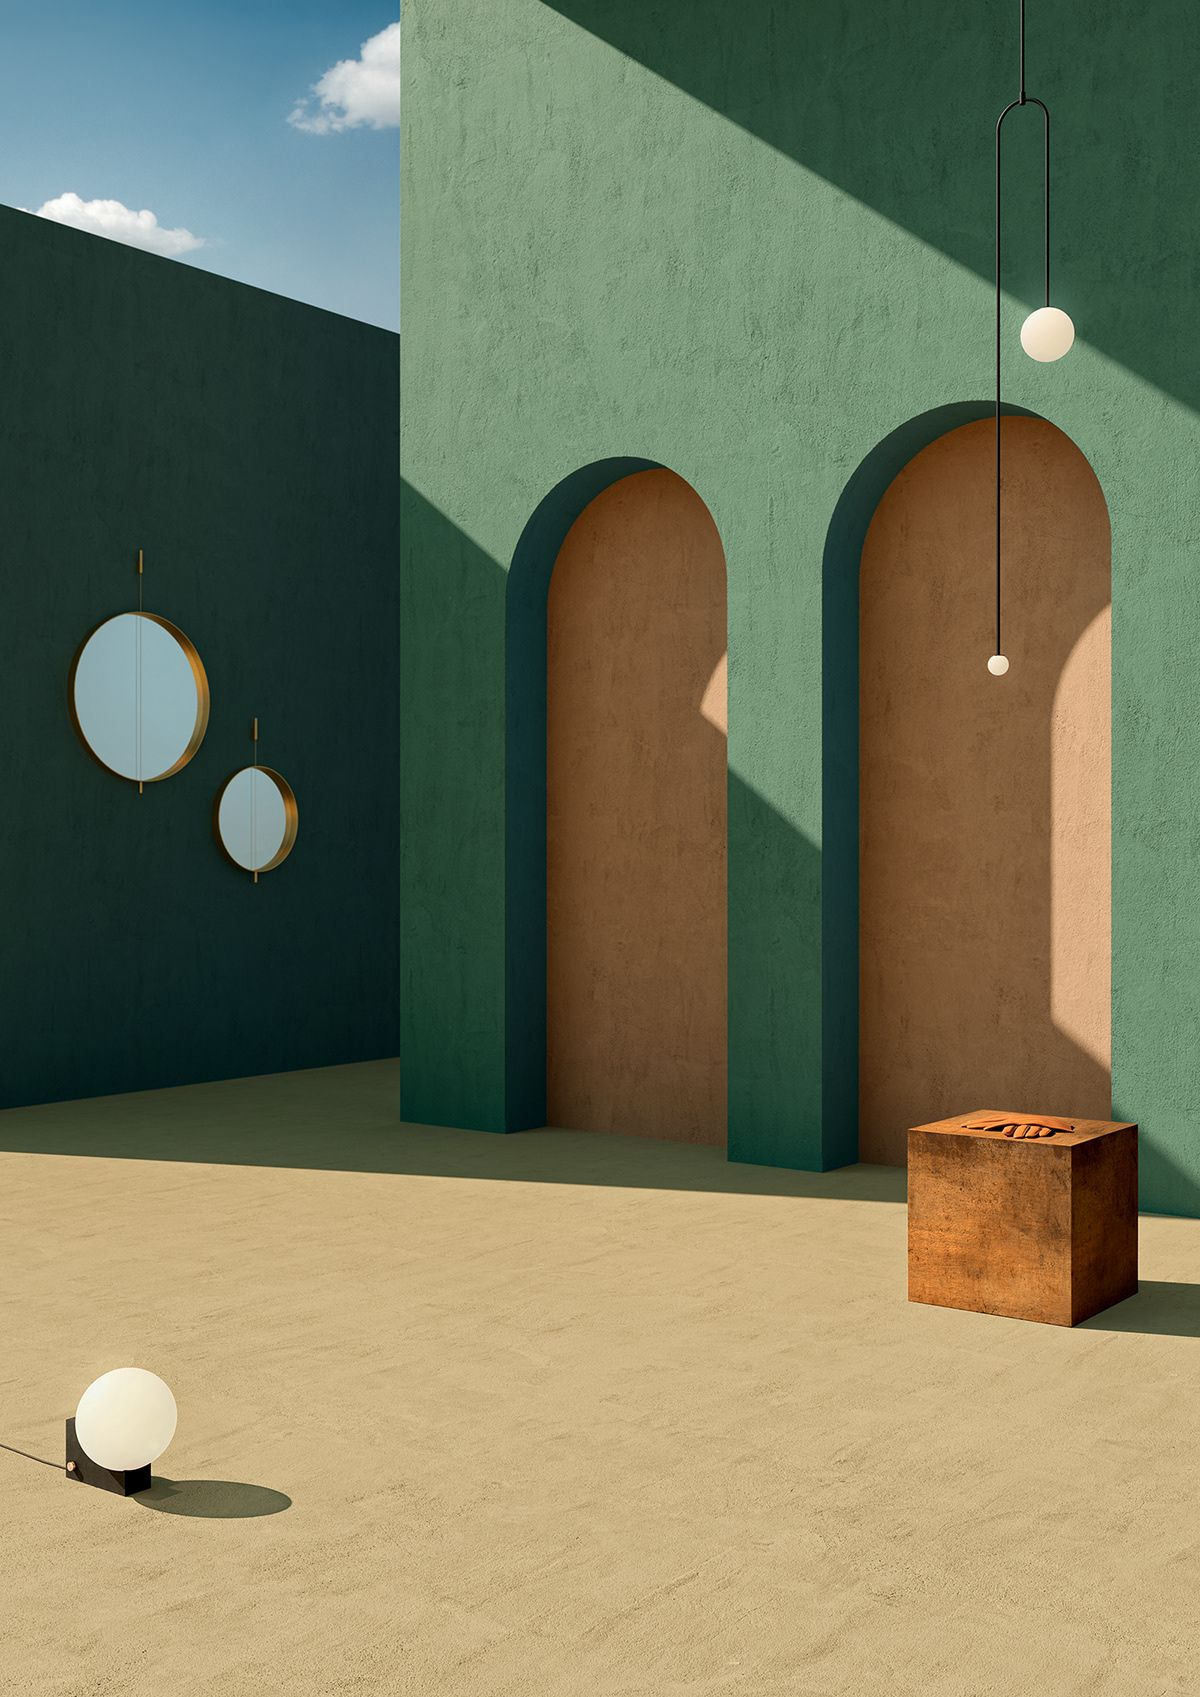 INSIDE ART // DE CHIRICO on Behance De chirico